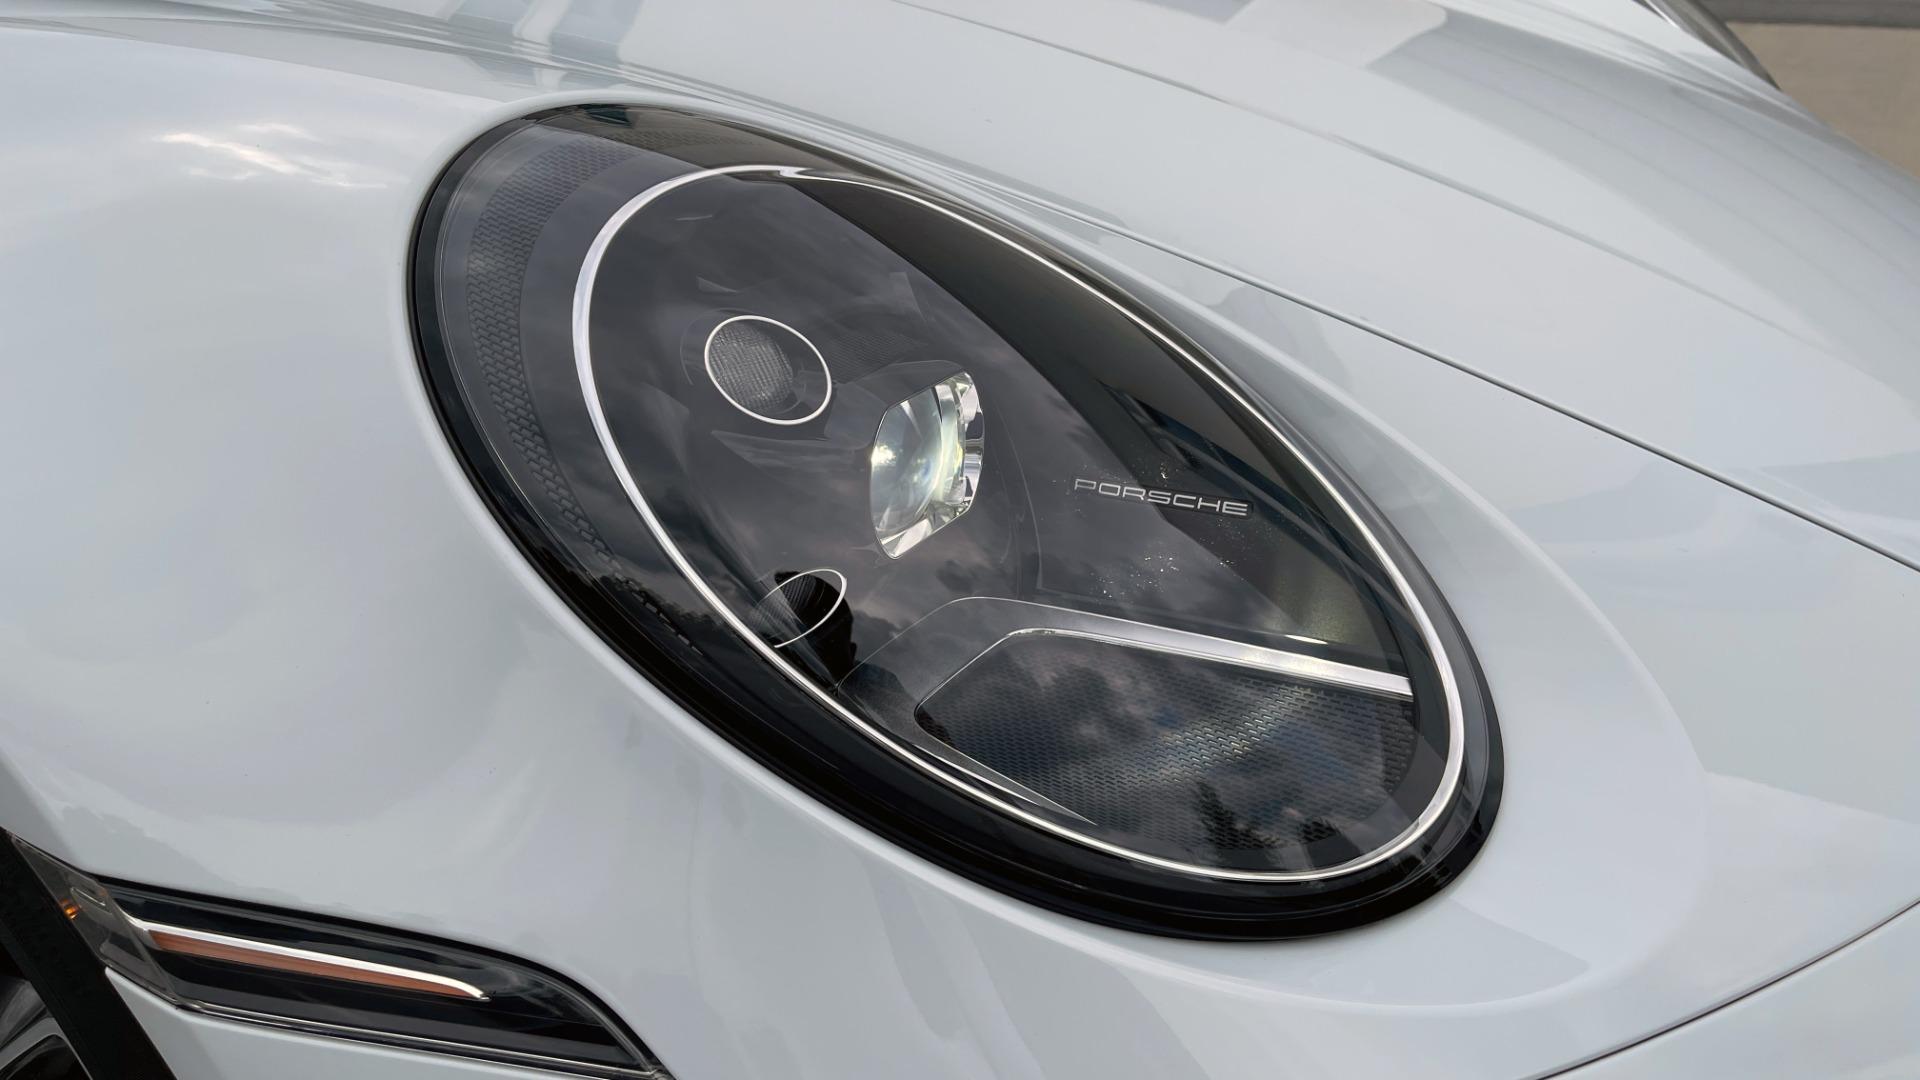 Used 2020 Porsche 911 CARRERA 4S CABRIOLET PREMIUM SPORT PKG / NAV / BOSE / LIGHT DESIGN PKG for sale $167,595 at Formula Imports in Charlotte NC 28227 38